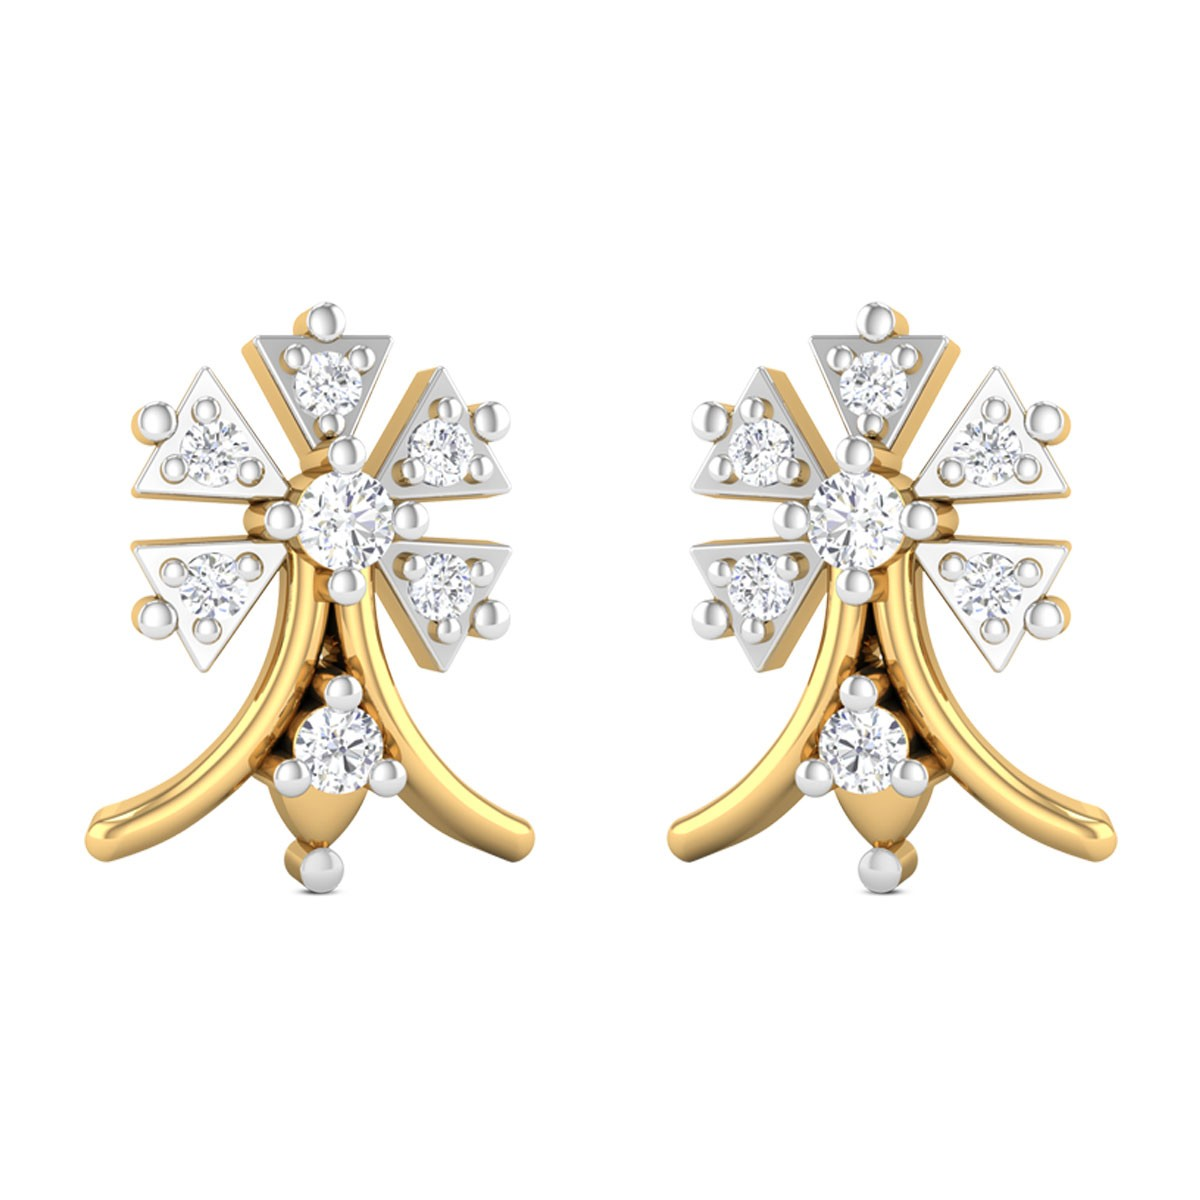 Octavia Diamond Earrings